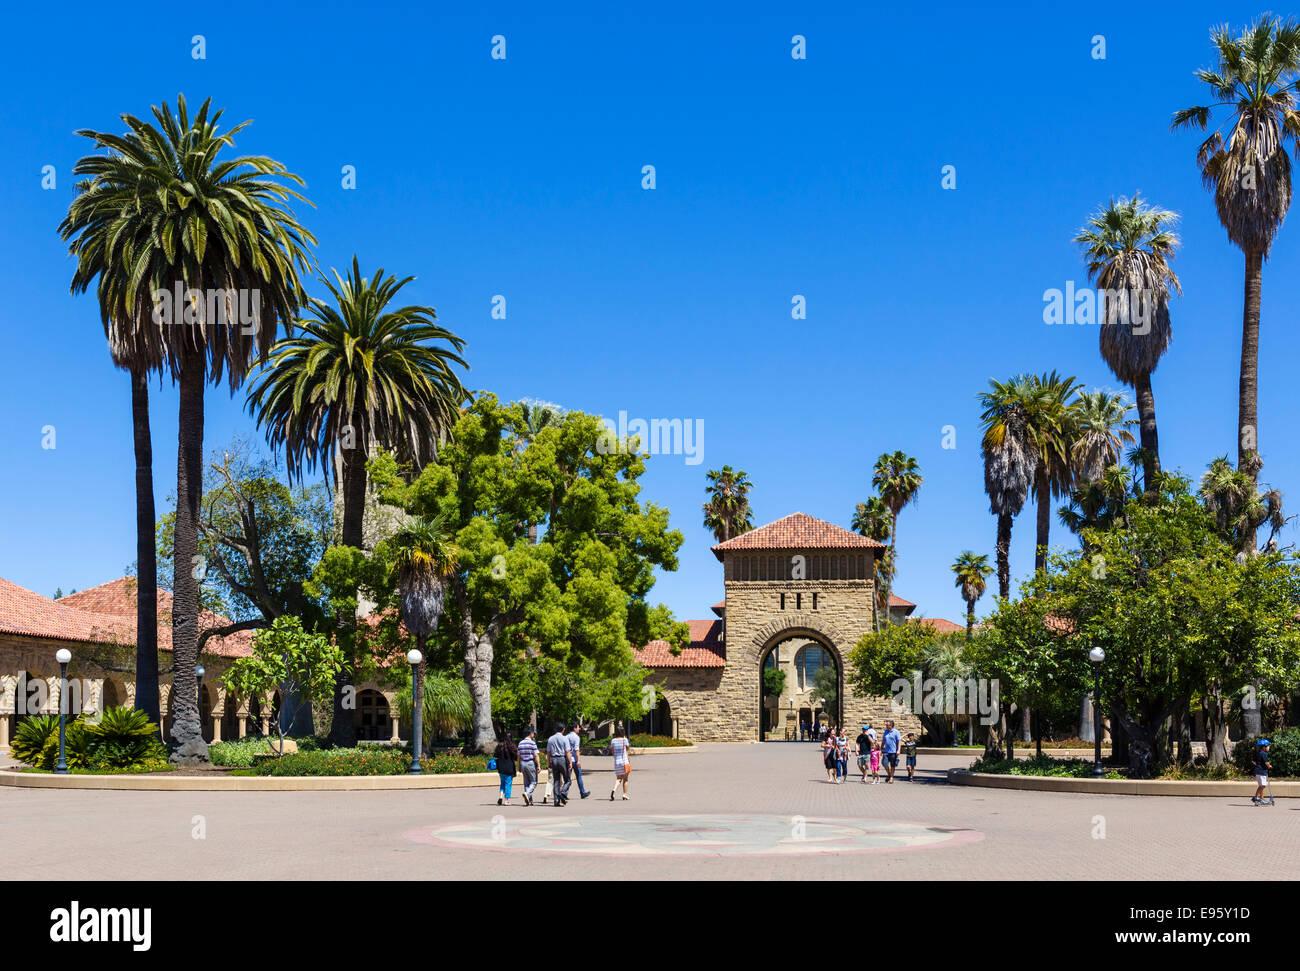 Main Quad, Stanford University, Palo Alto, California, USA - Stock Image